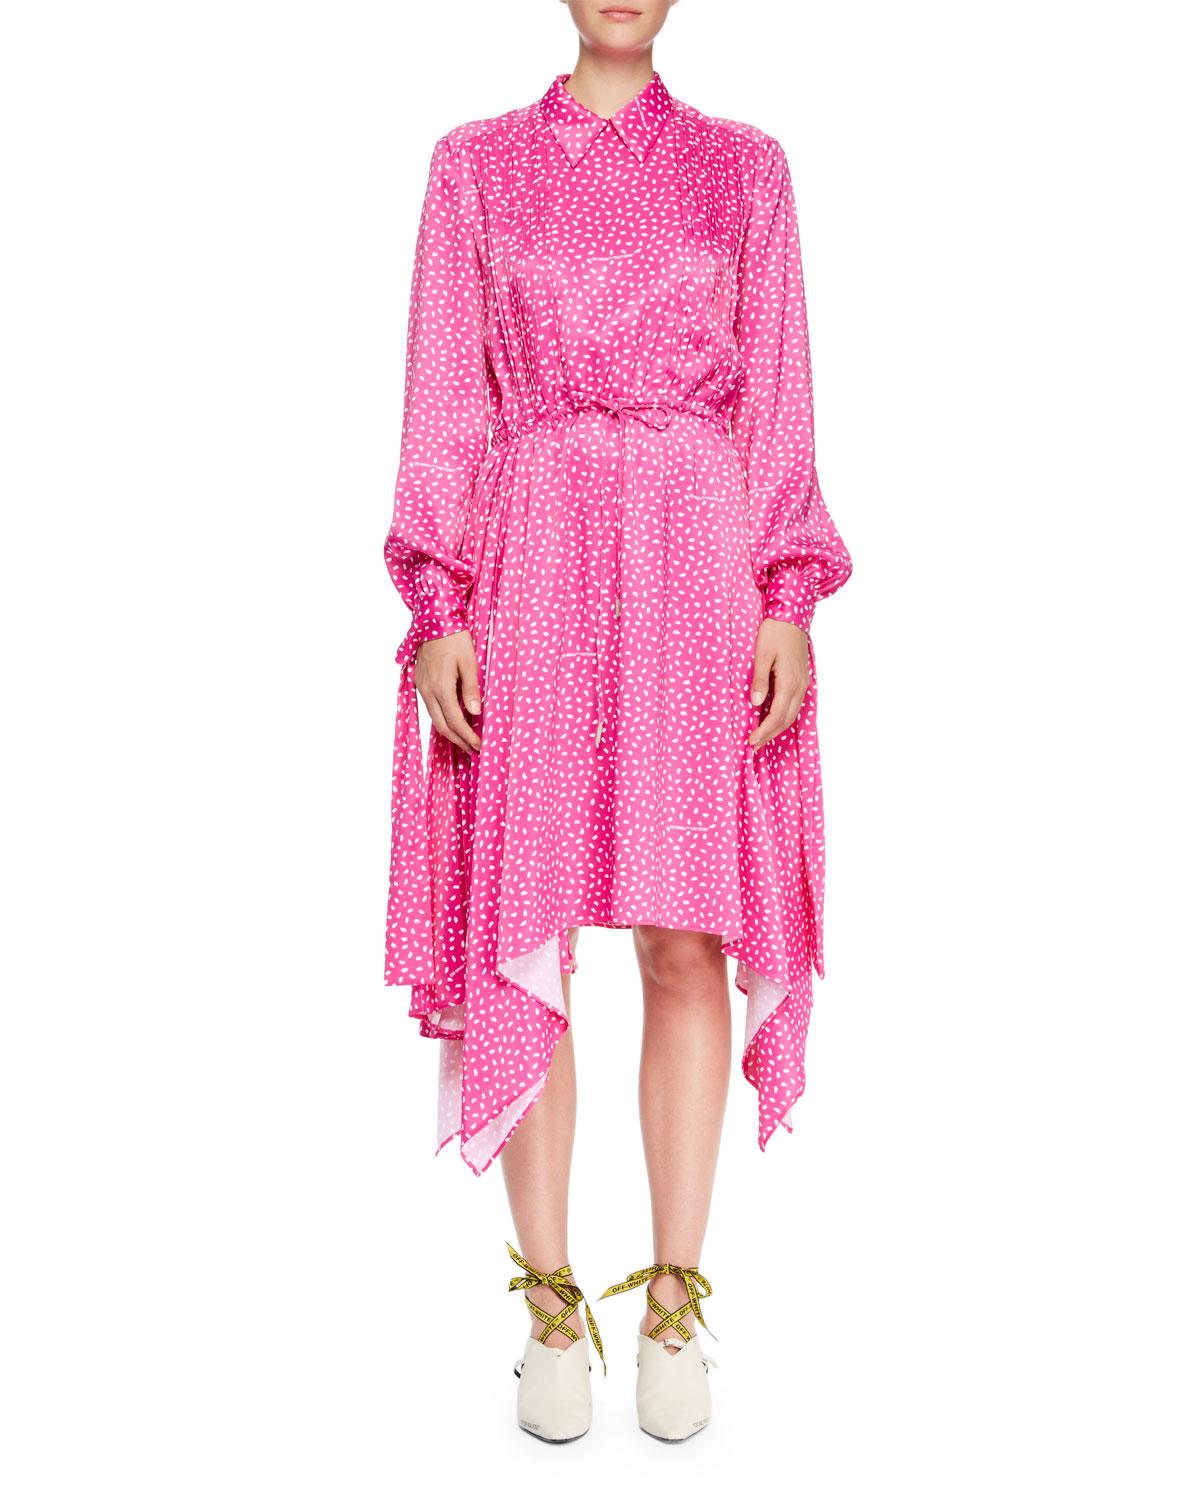 Dot-Print Drawstring Satin Dress with Hanky Hem